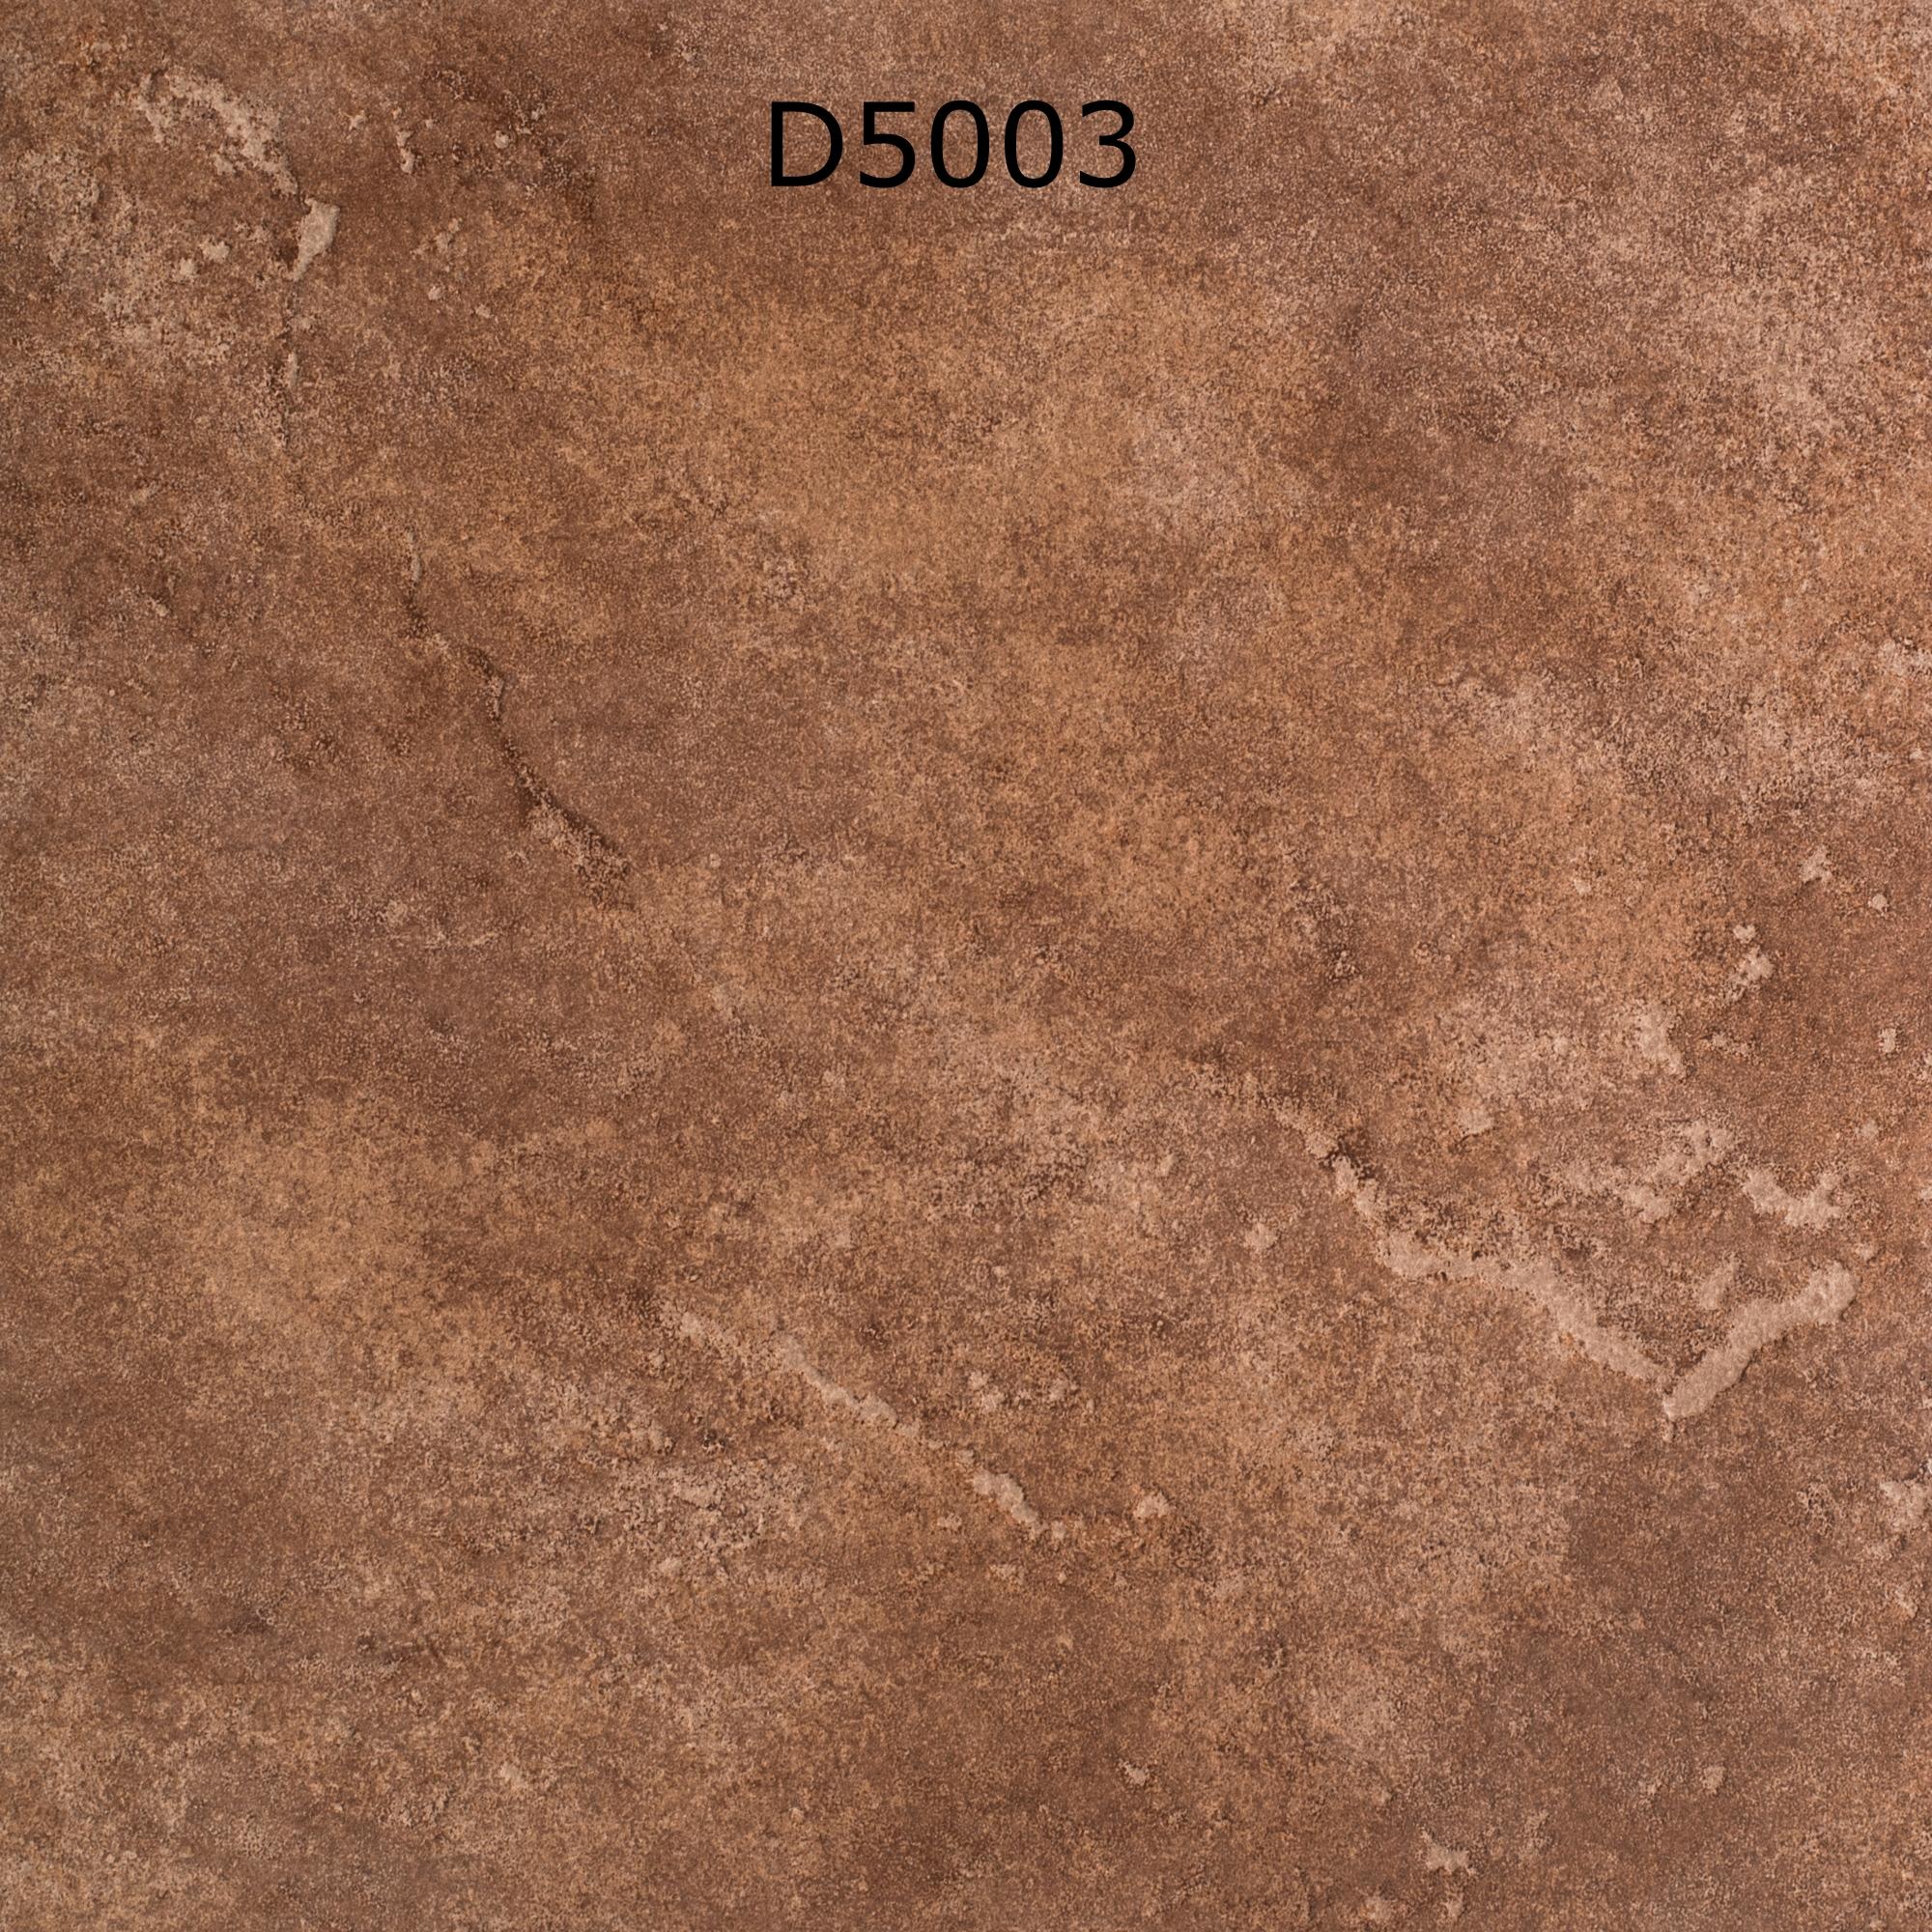 D5003